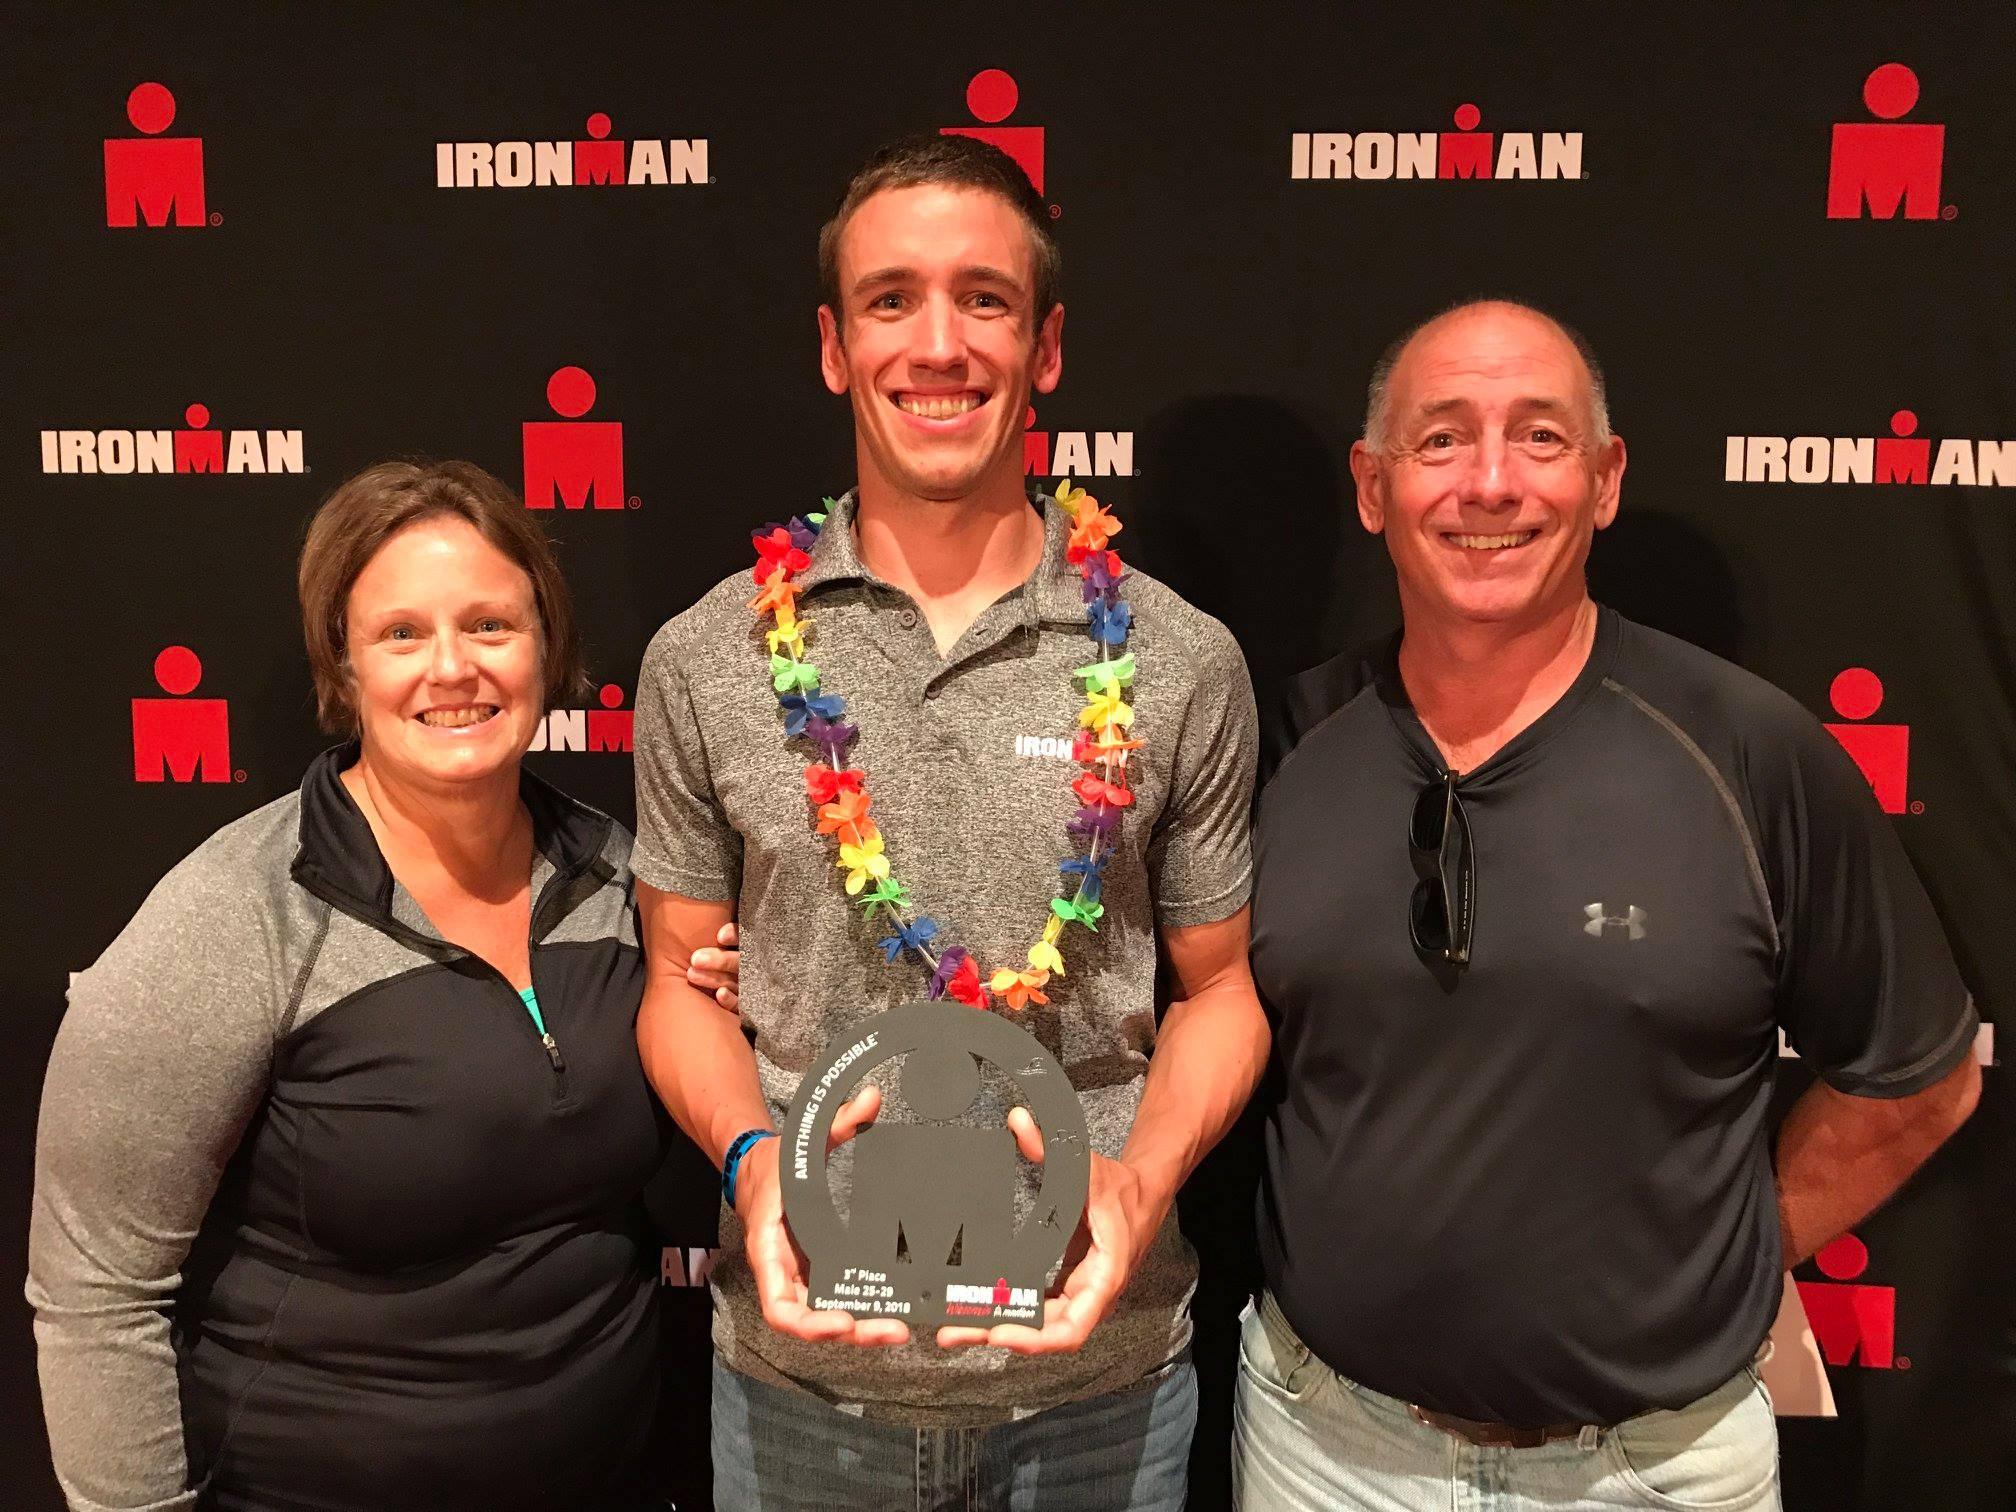 Coach_Terry_Wilson_Pursuit_of_The_Perfect_Race_IRONMAN_Wisconsin_Nick_Serratore_Awards.jpg